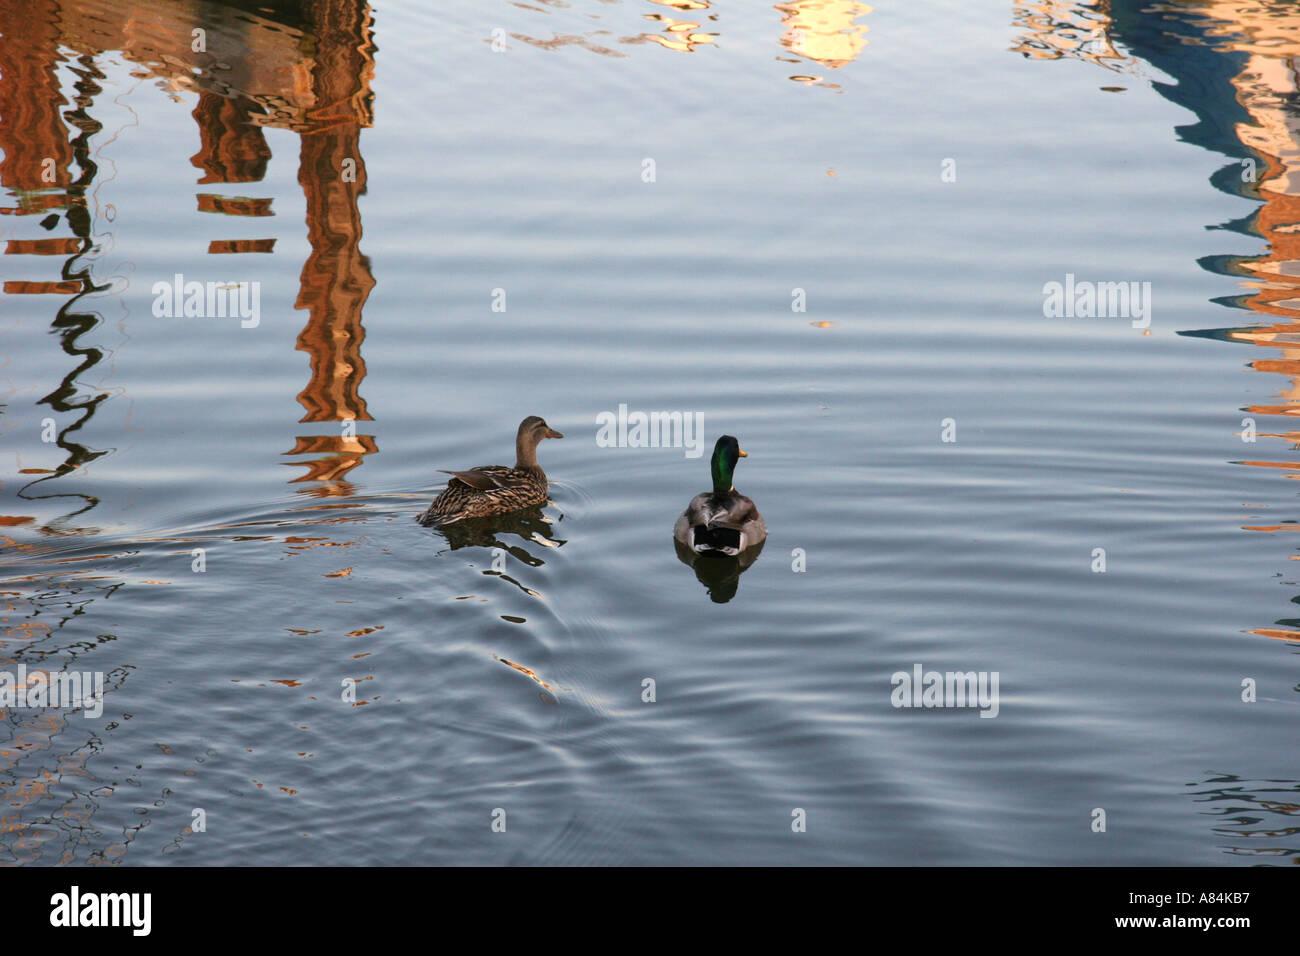 Mallard Ducks on rippling water - Stock Image